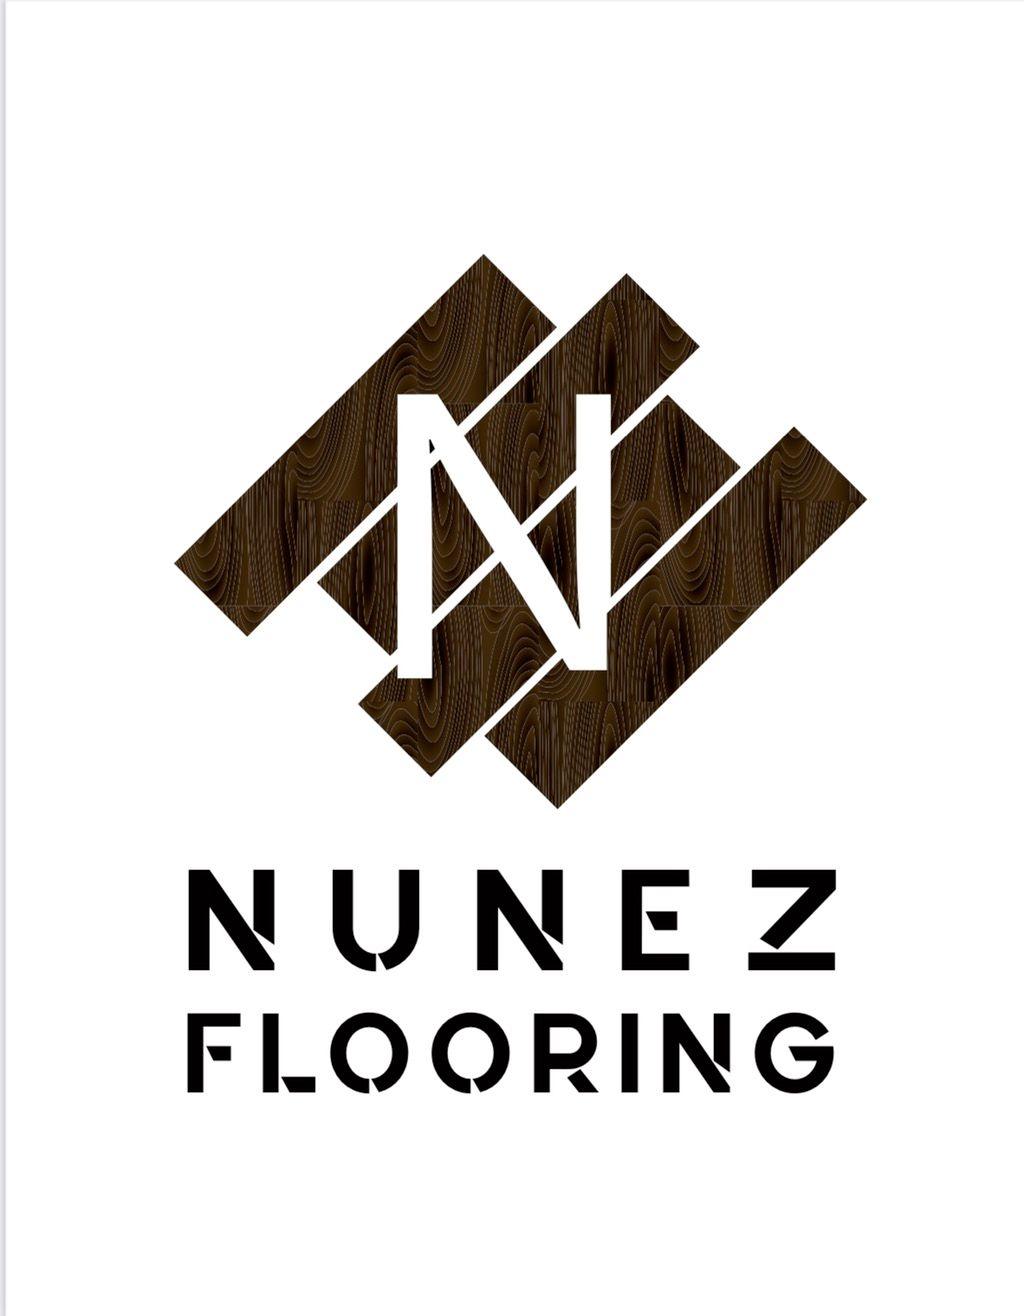 Nunez Flooring